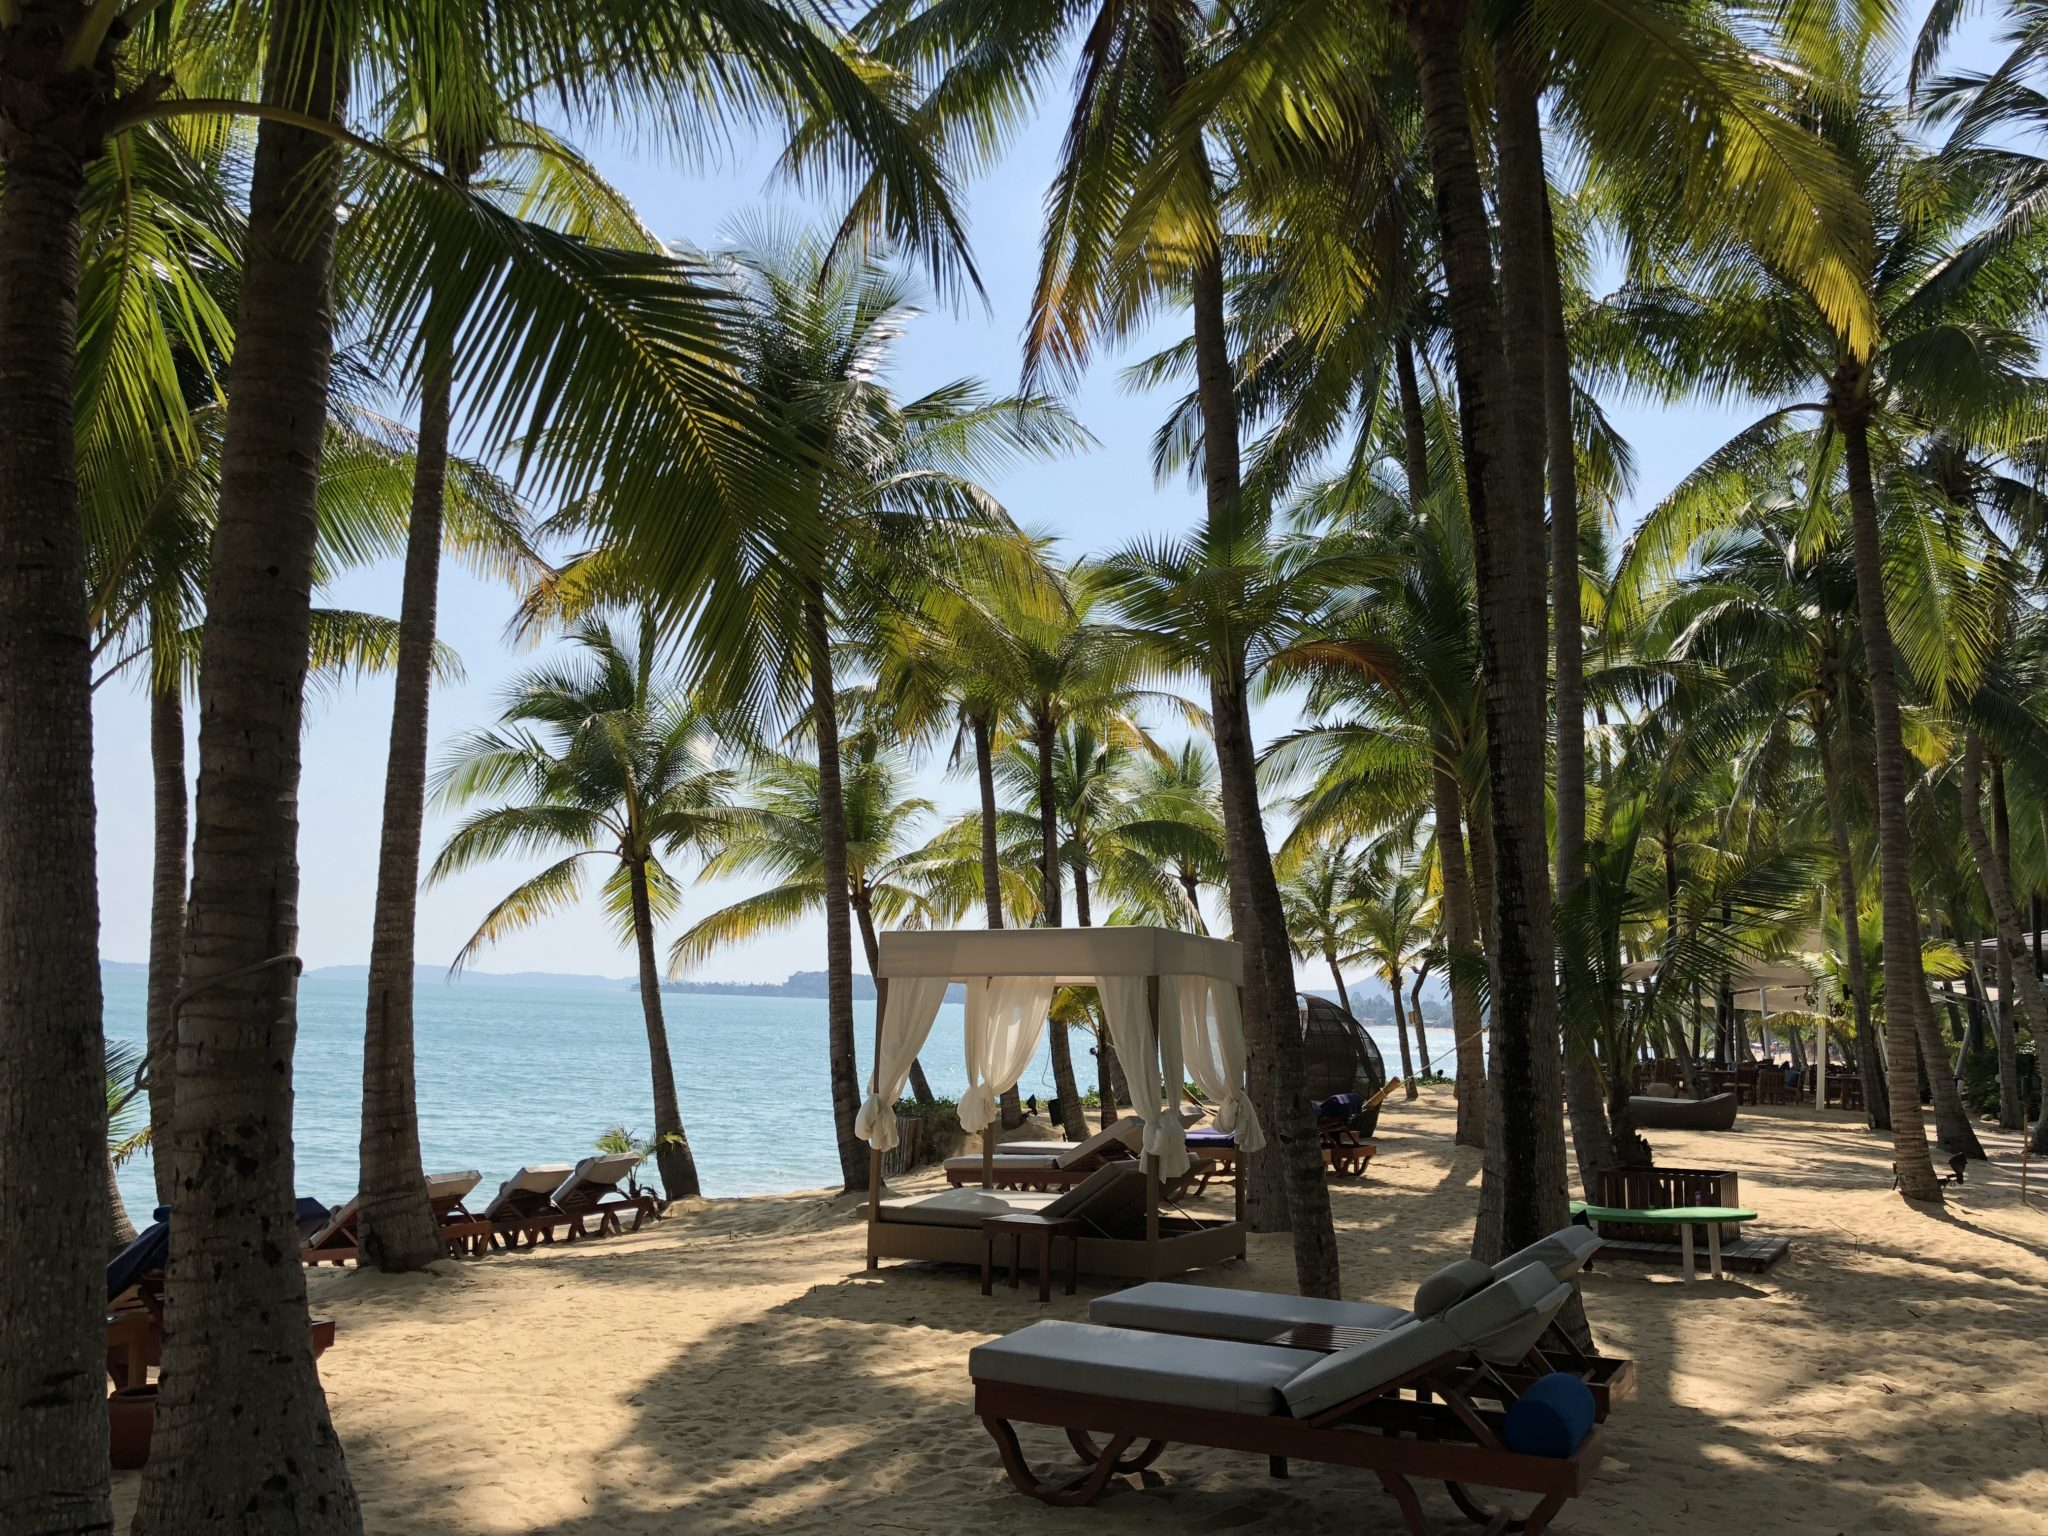 Maenam beach, маенам пляж